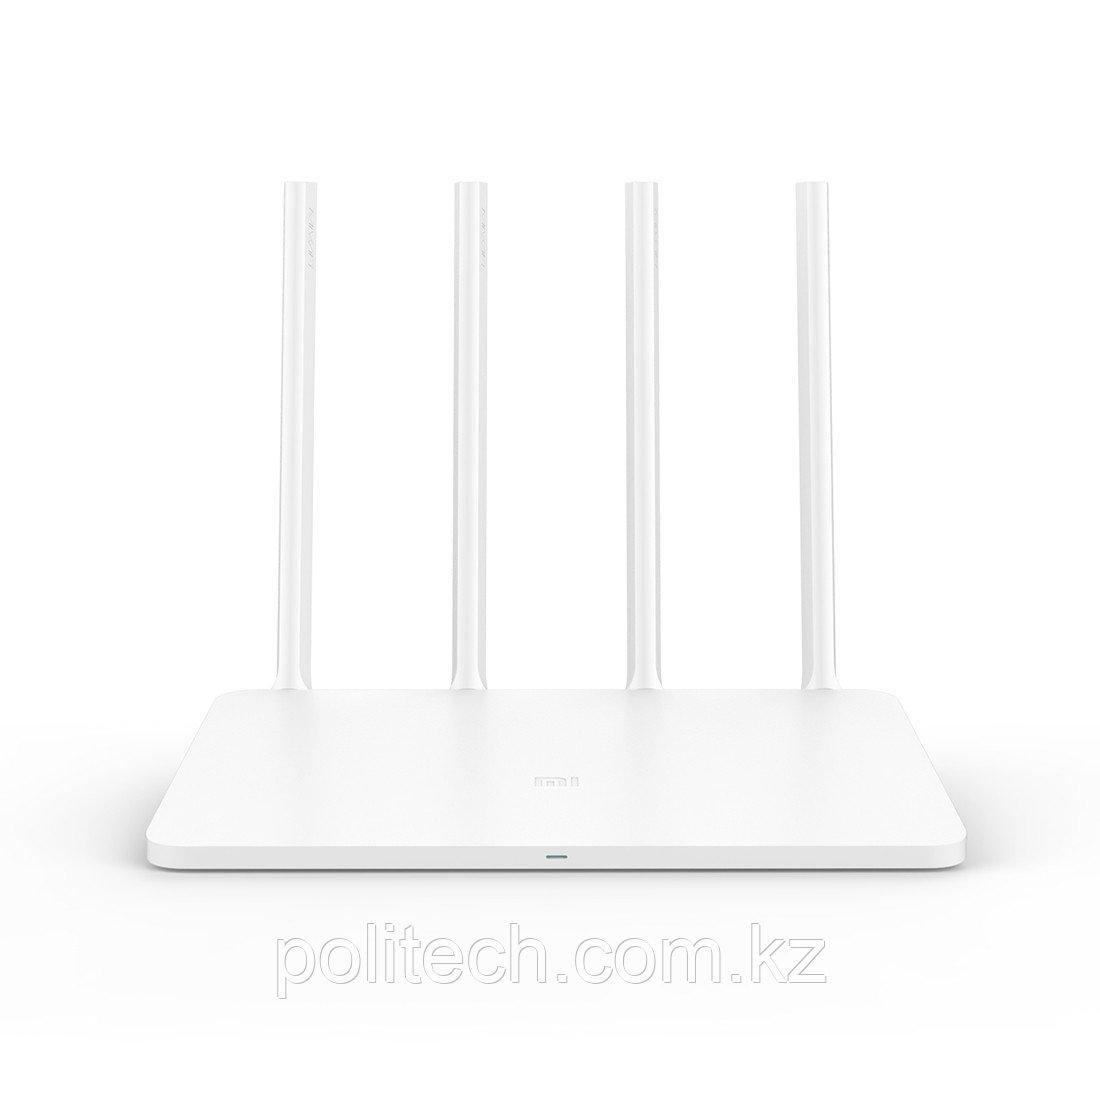 Маршрутизатор Wi-Fi точка доступа Xiaomi Mi Router 3 EU adapter